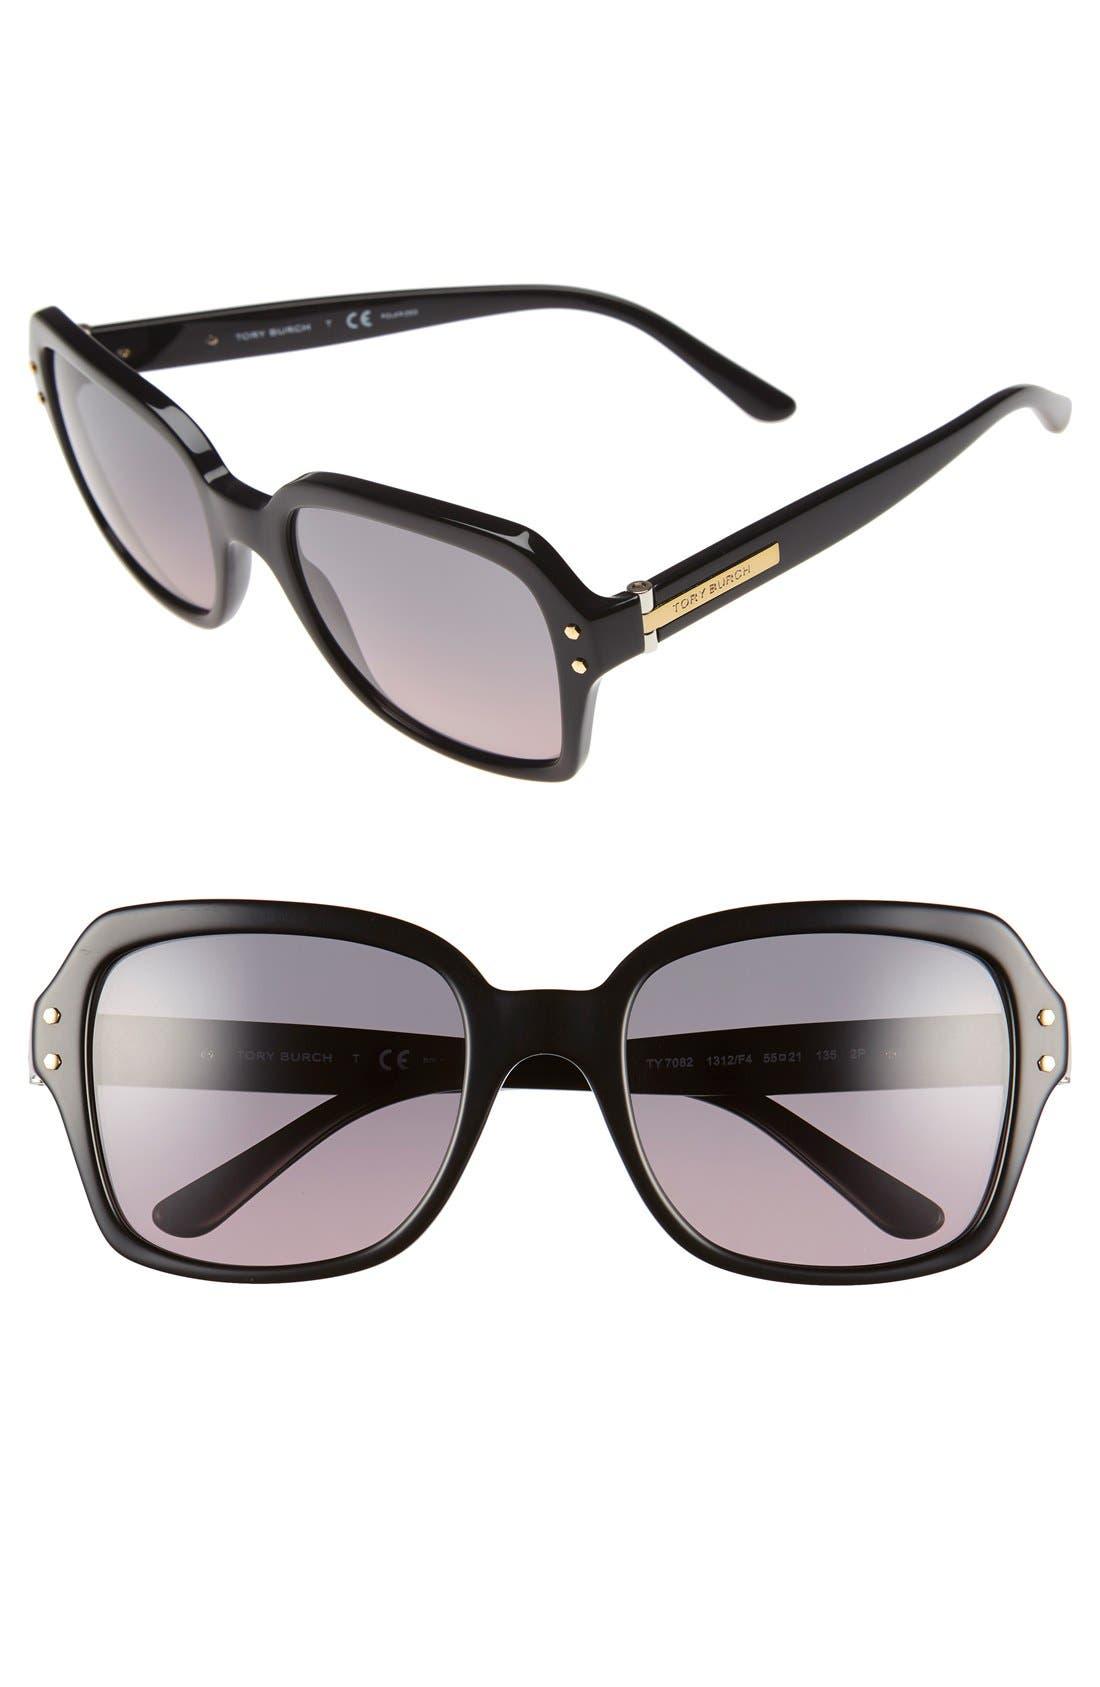 Main Image - Tory Burch 55mm Polarized Sunglasses